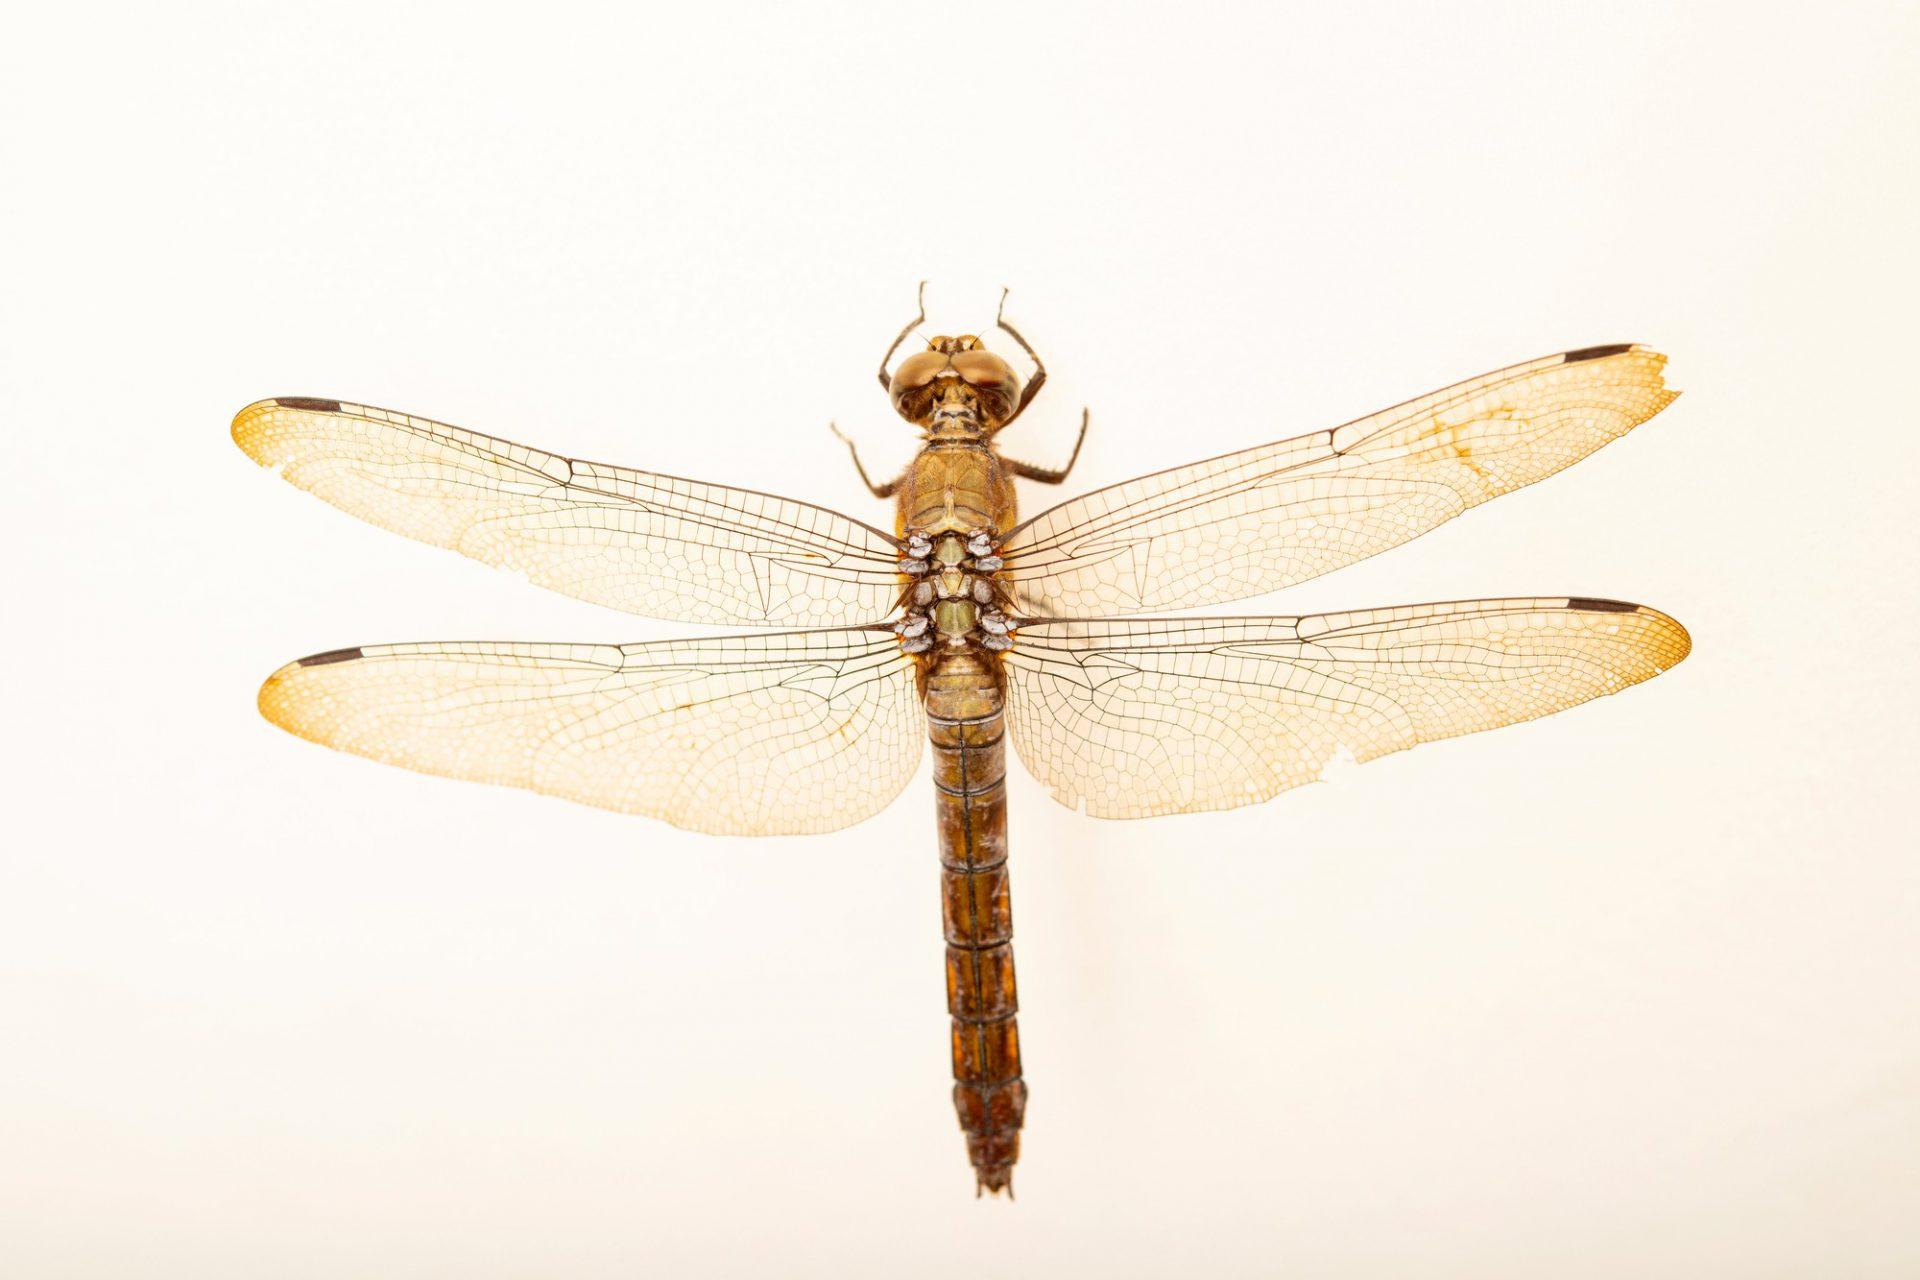 Photo: A female grasshawk dragonfly (Neurothemis fluctuans) wild caught in Jakarta, Indonesia.